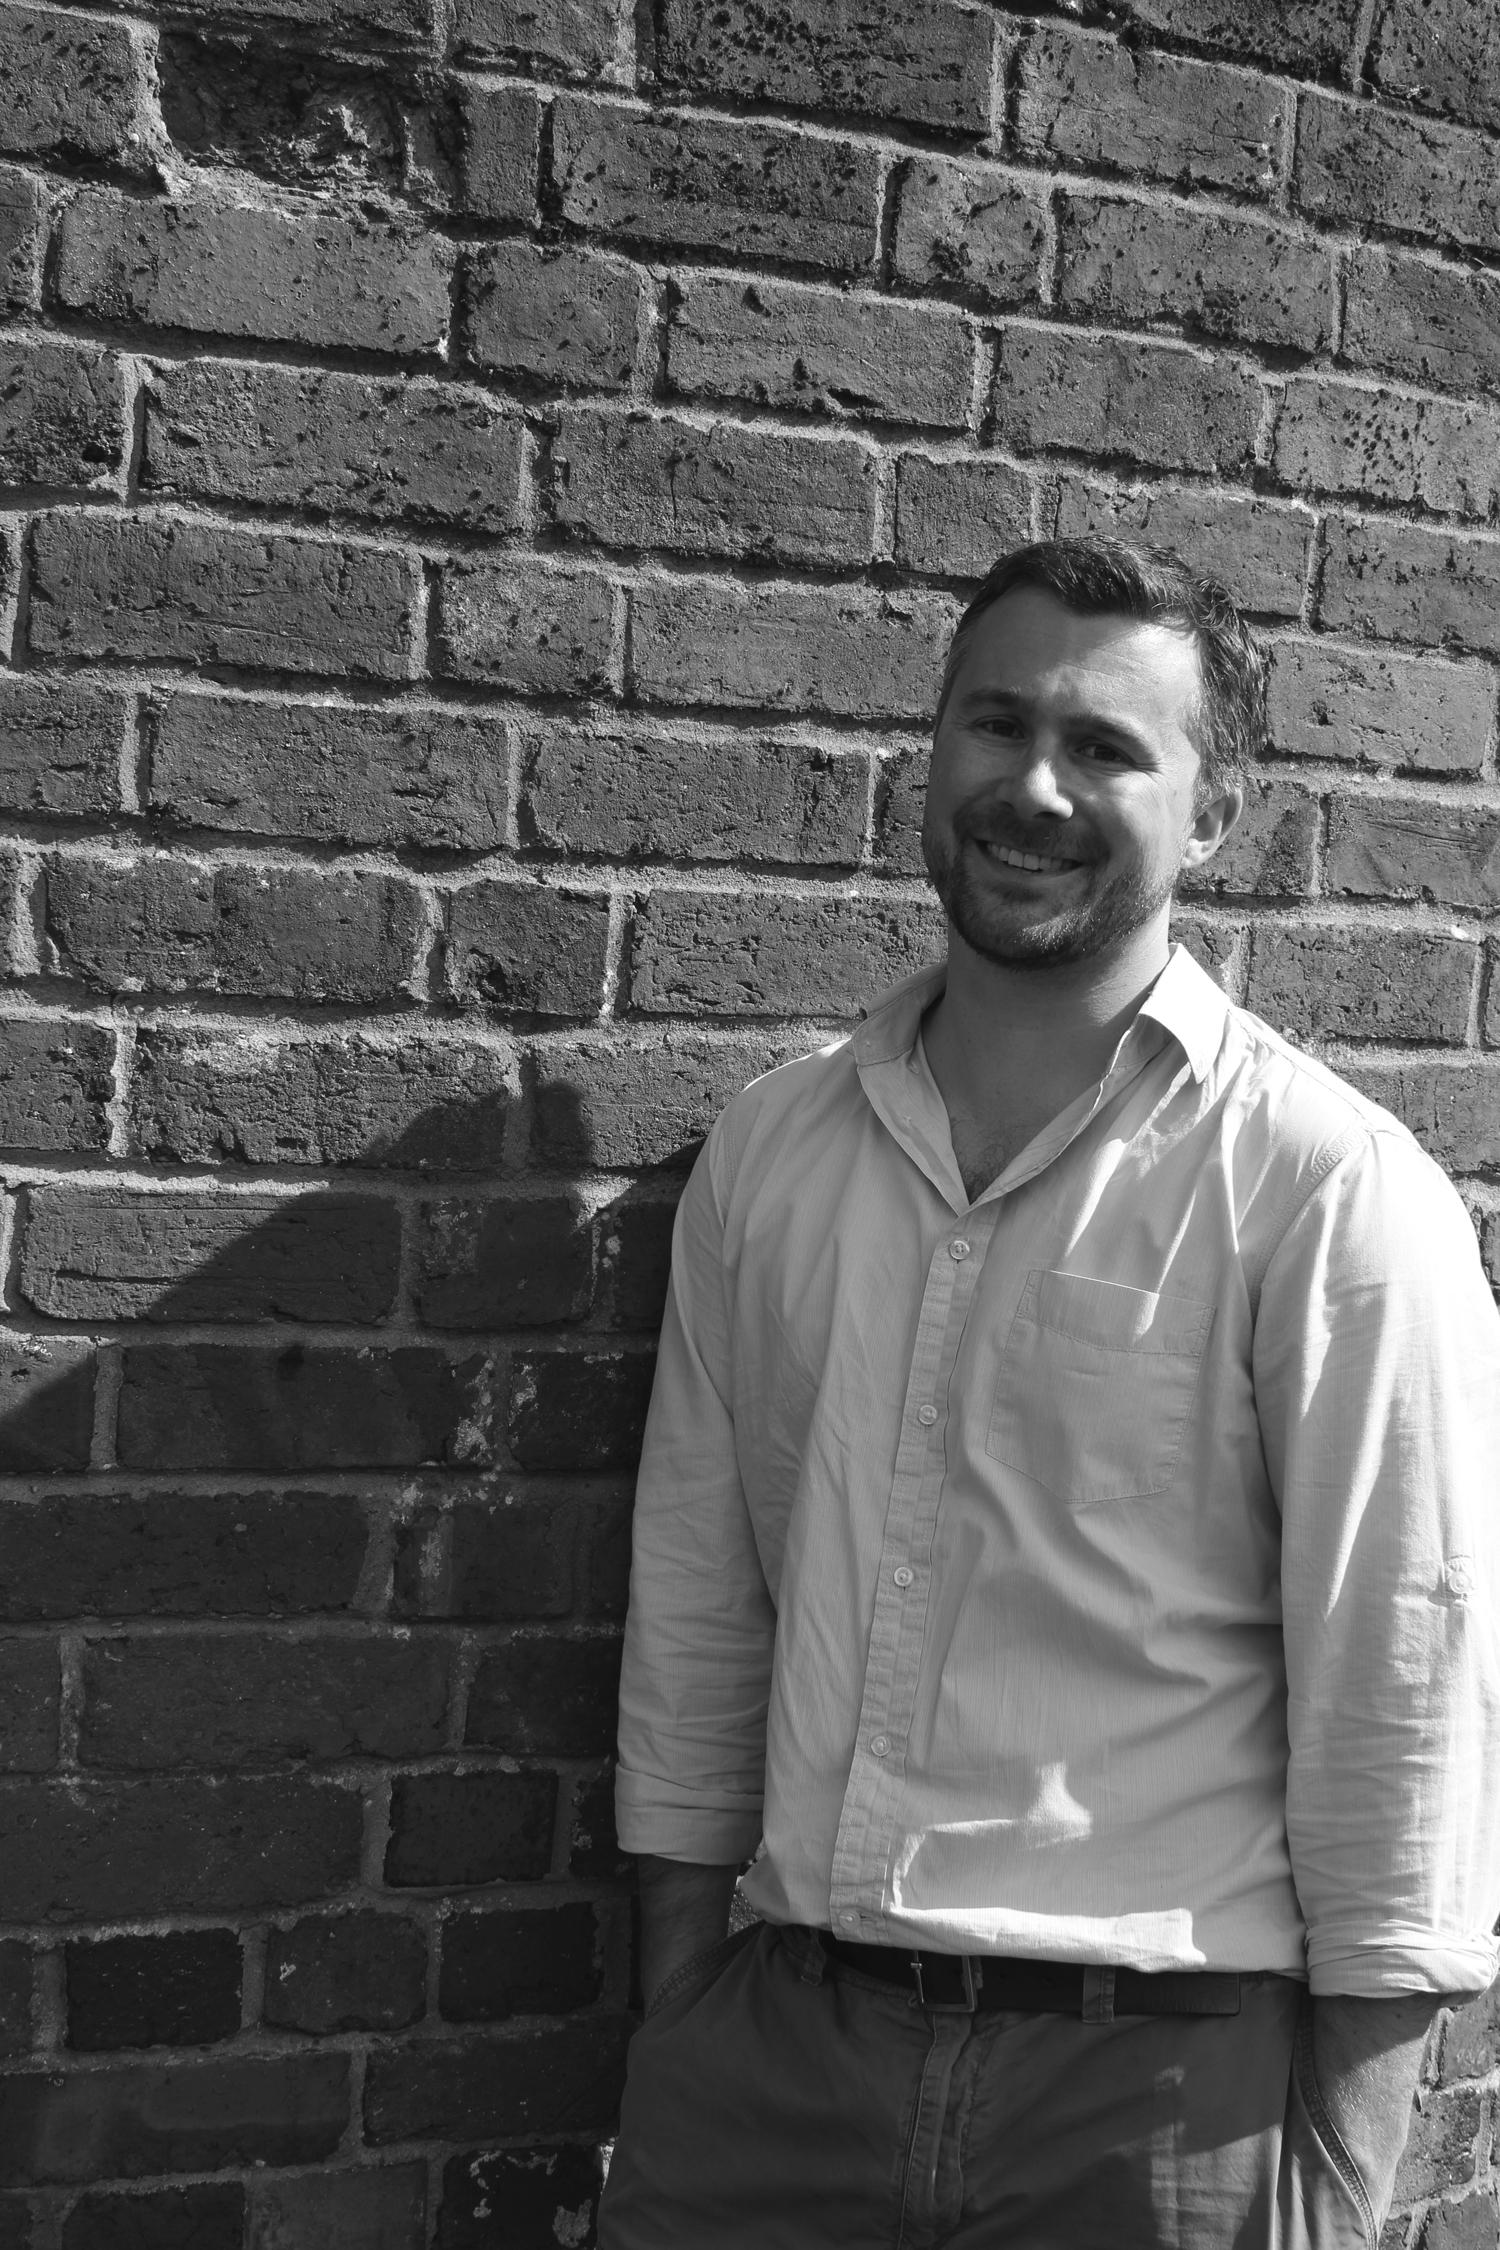 Birmingham architect Ben Mainwood with brick wall